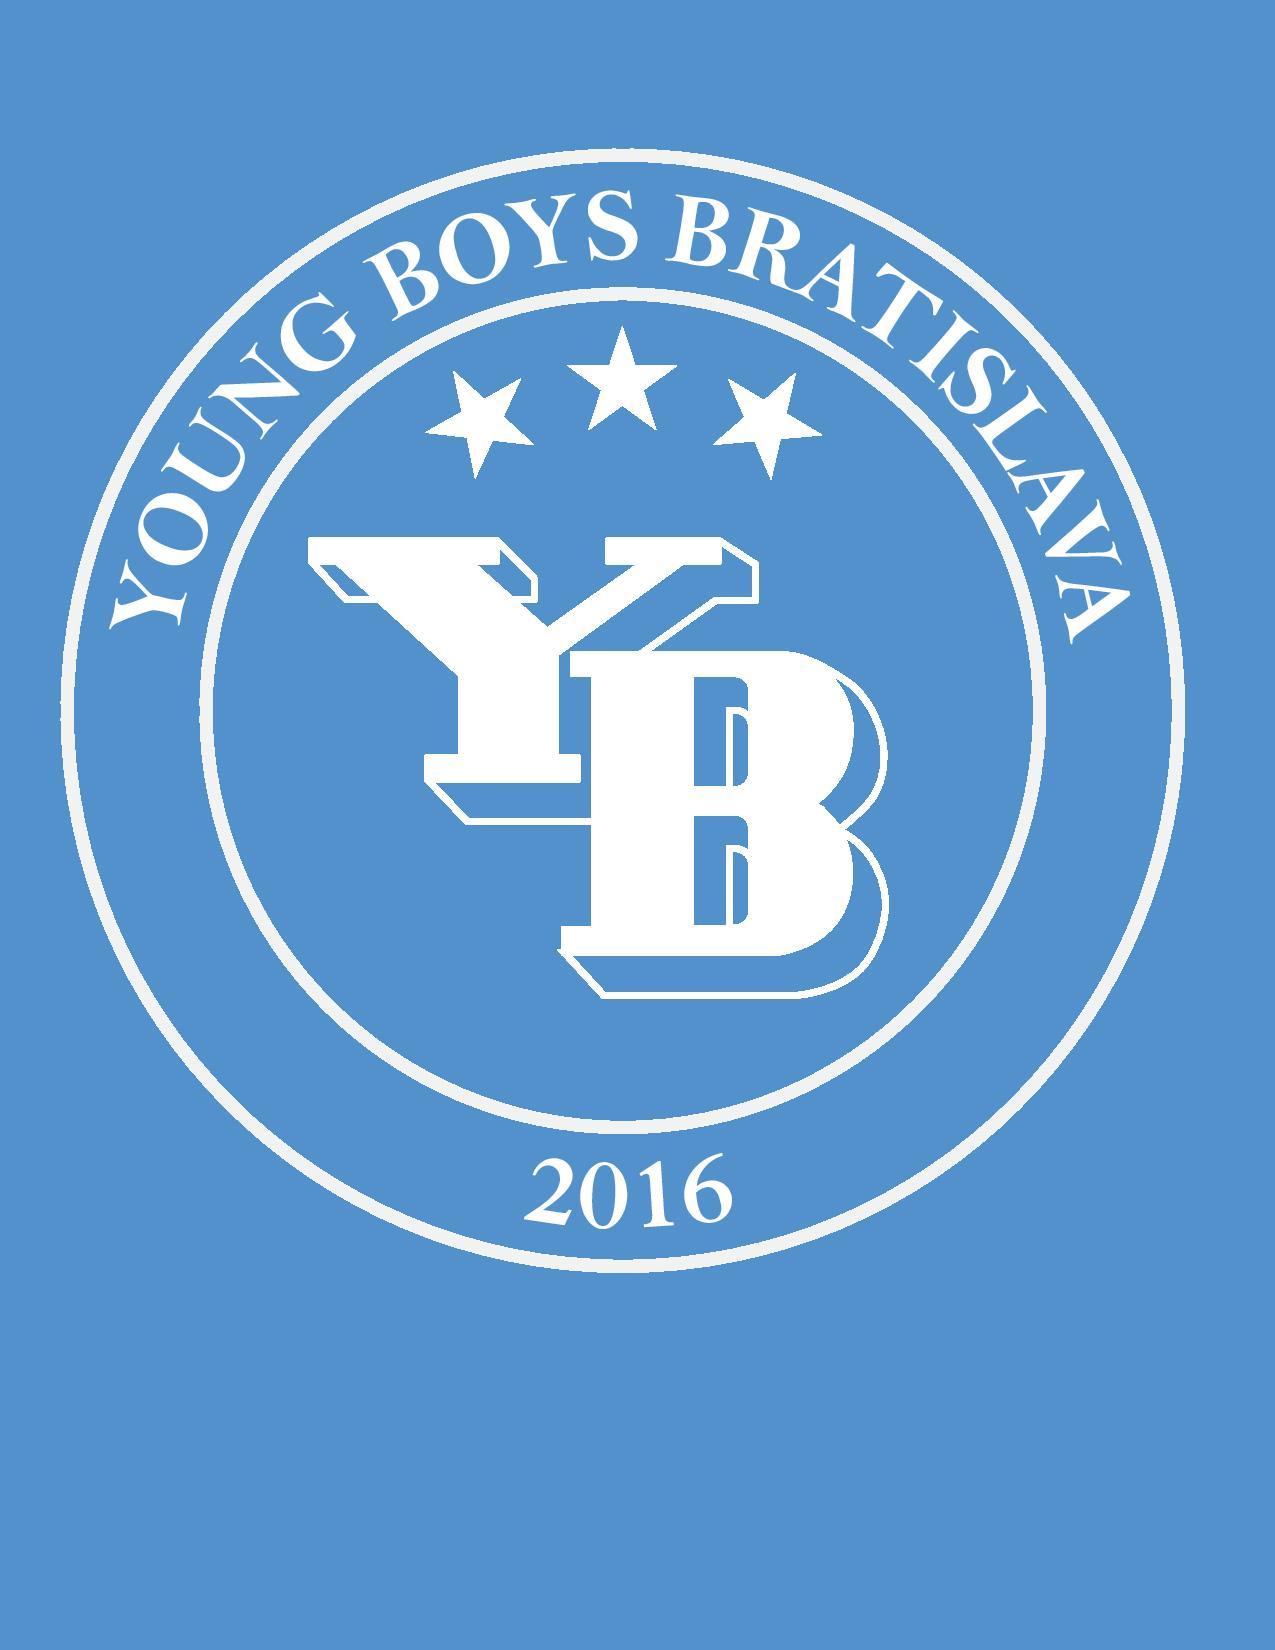 Young Boys Bratislava